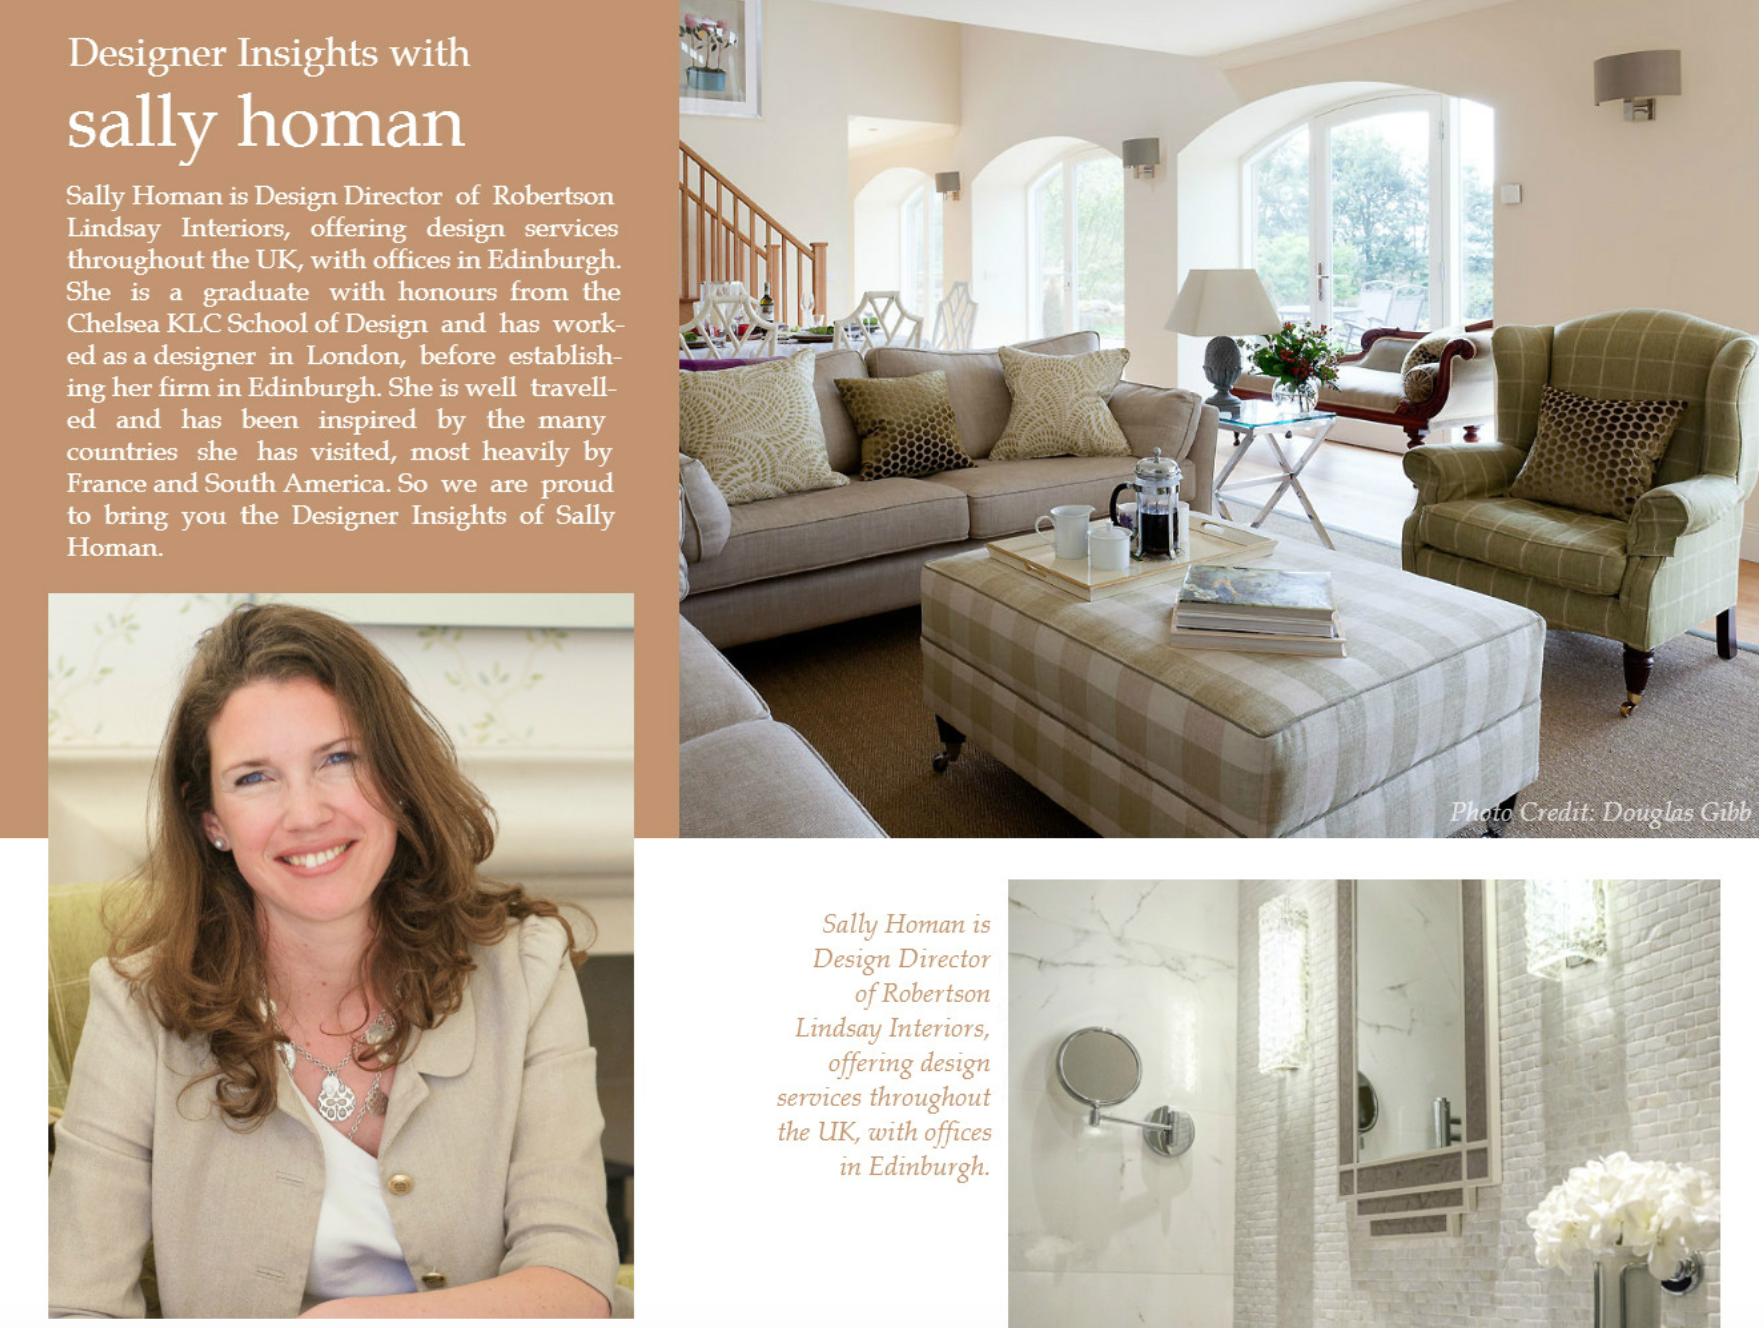 Designer Insights – interview with director Sally Homan